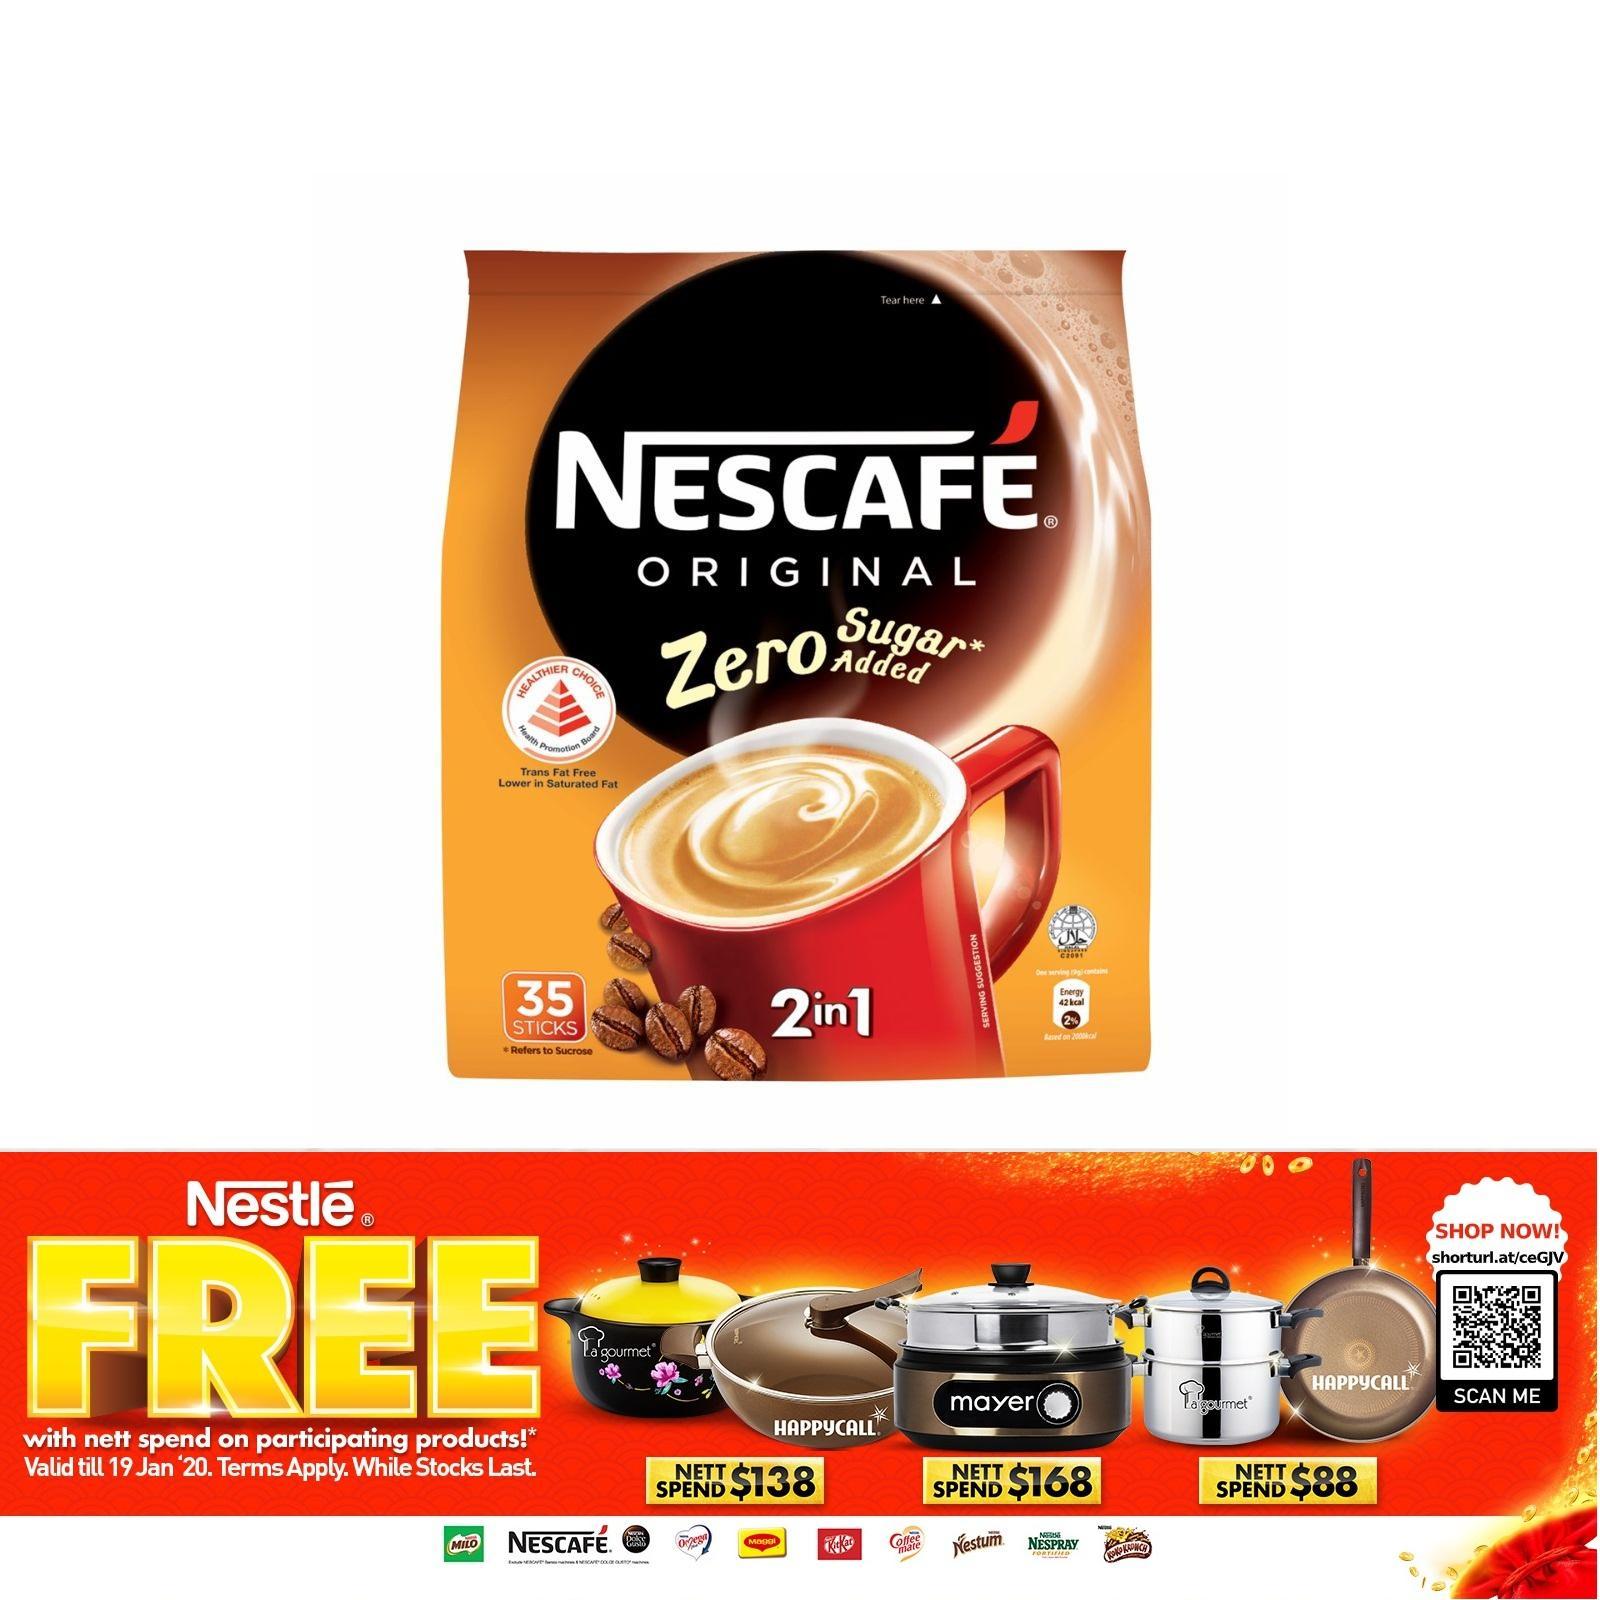 NESCAFE Zero Sugar Added 2 In 1 Instant Coffee 35S